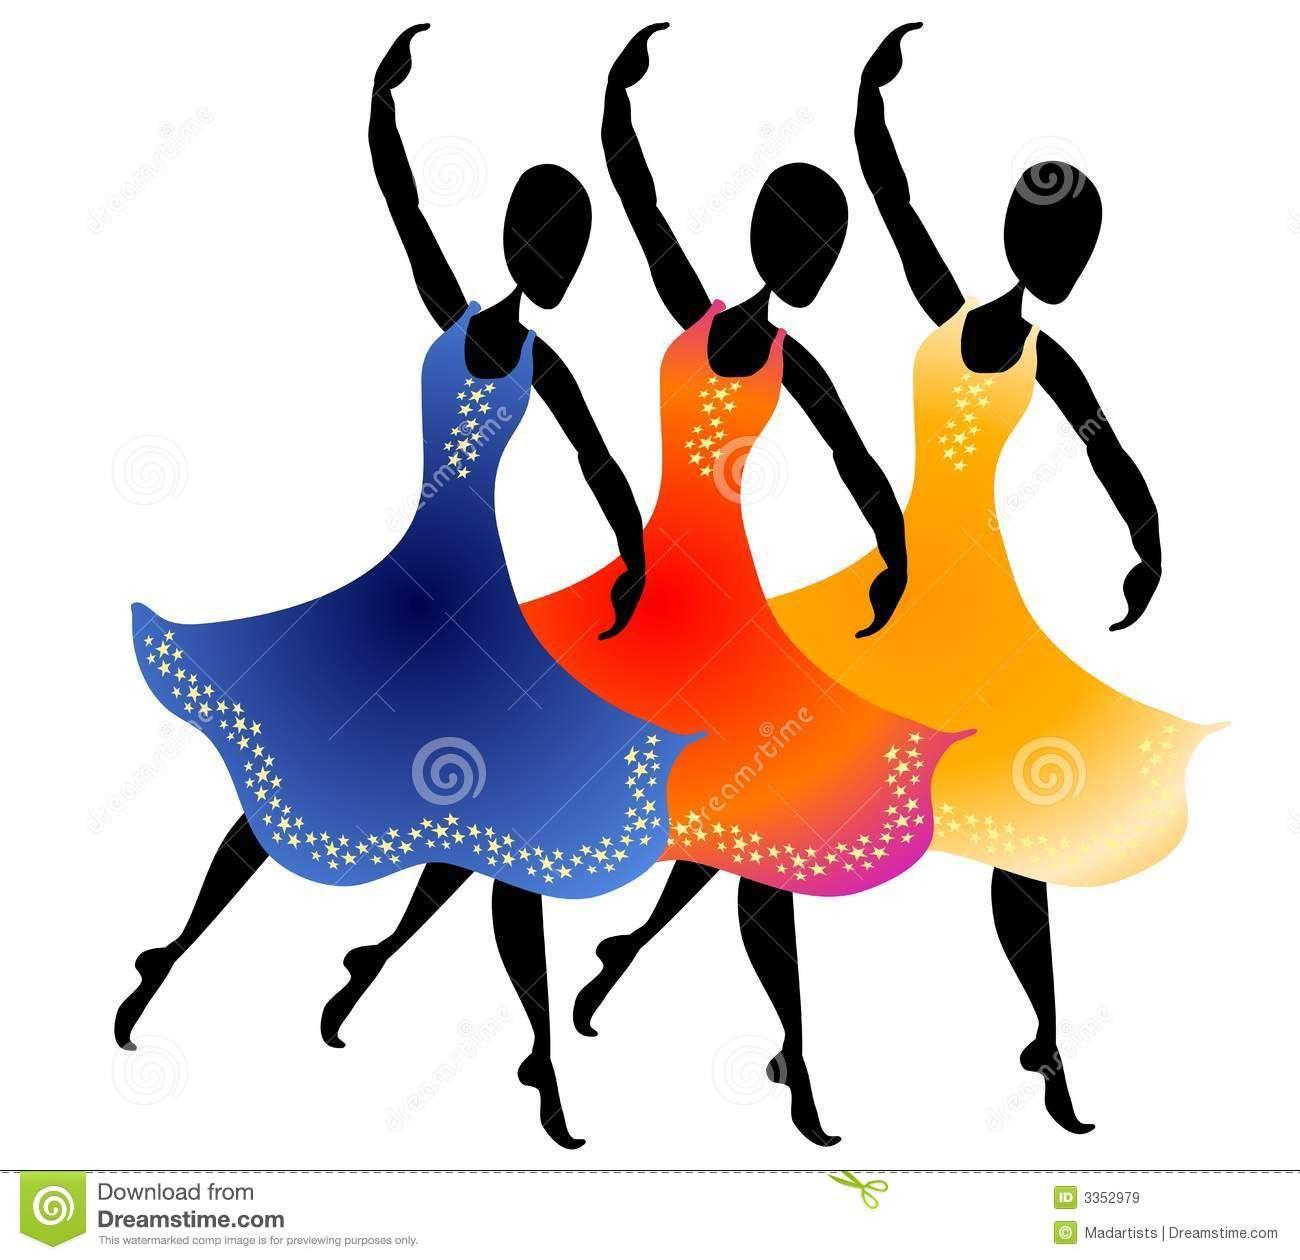 Dancing free clipart svg stock 3 Women Dancing Clip Art Royalty Free Stock Images - Image ... svg stock